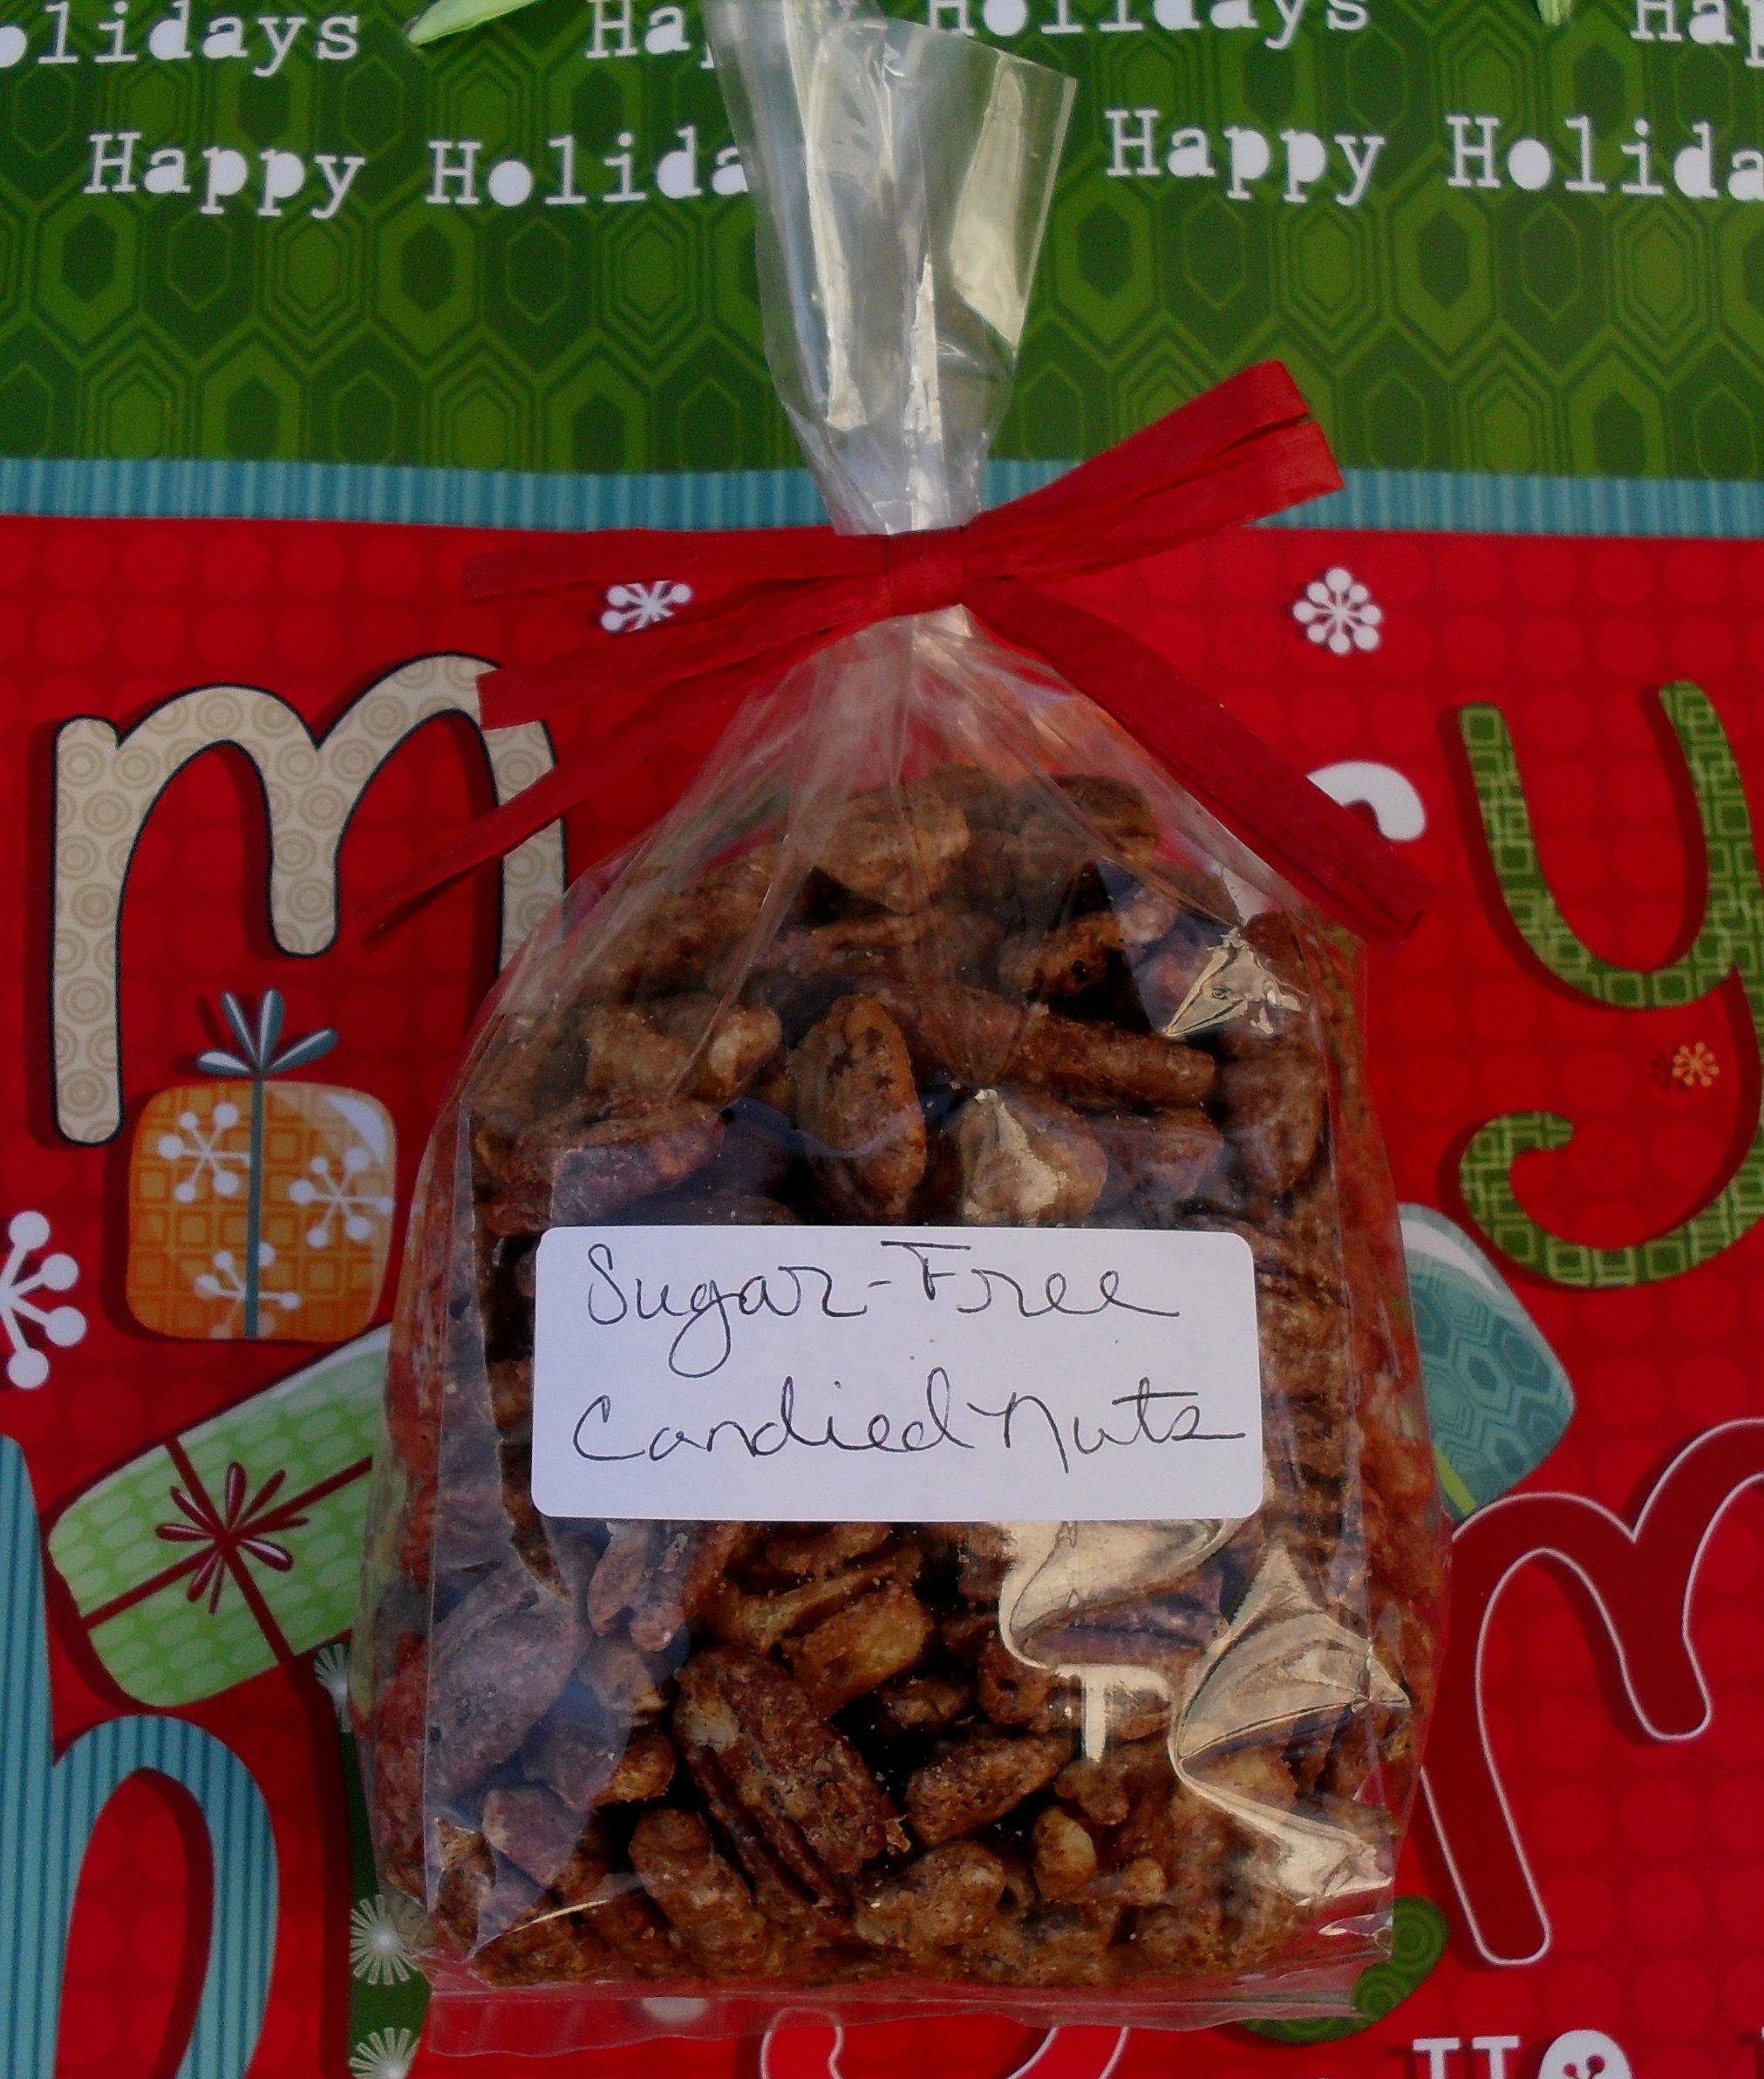 Sugar-Free Candied Nuts (low carb) | Veronica's Cornucopia